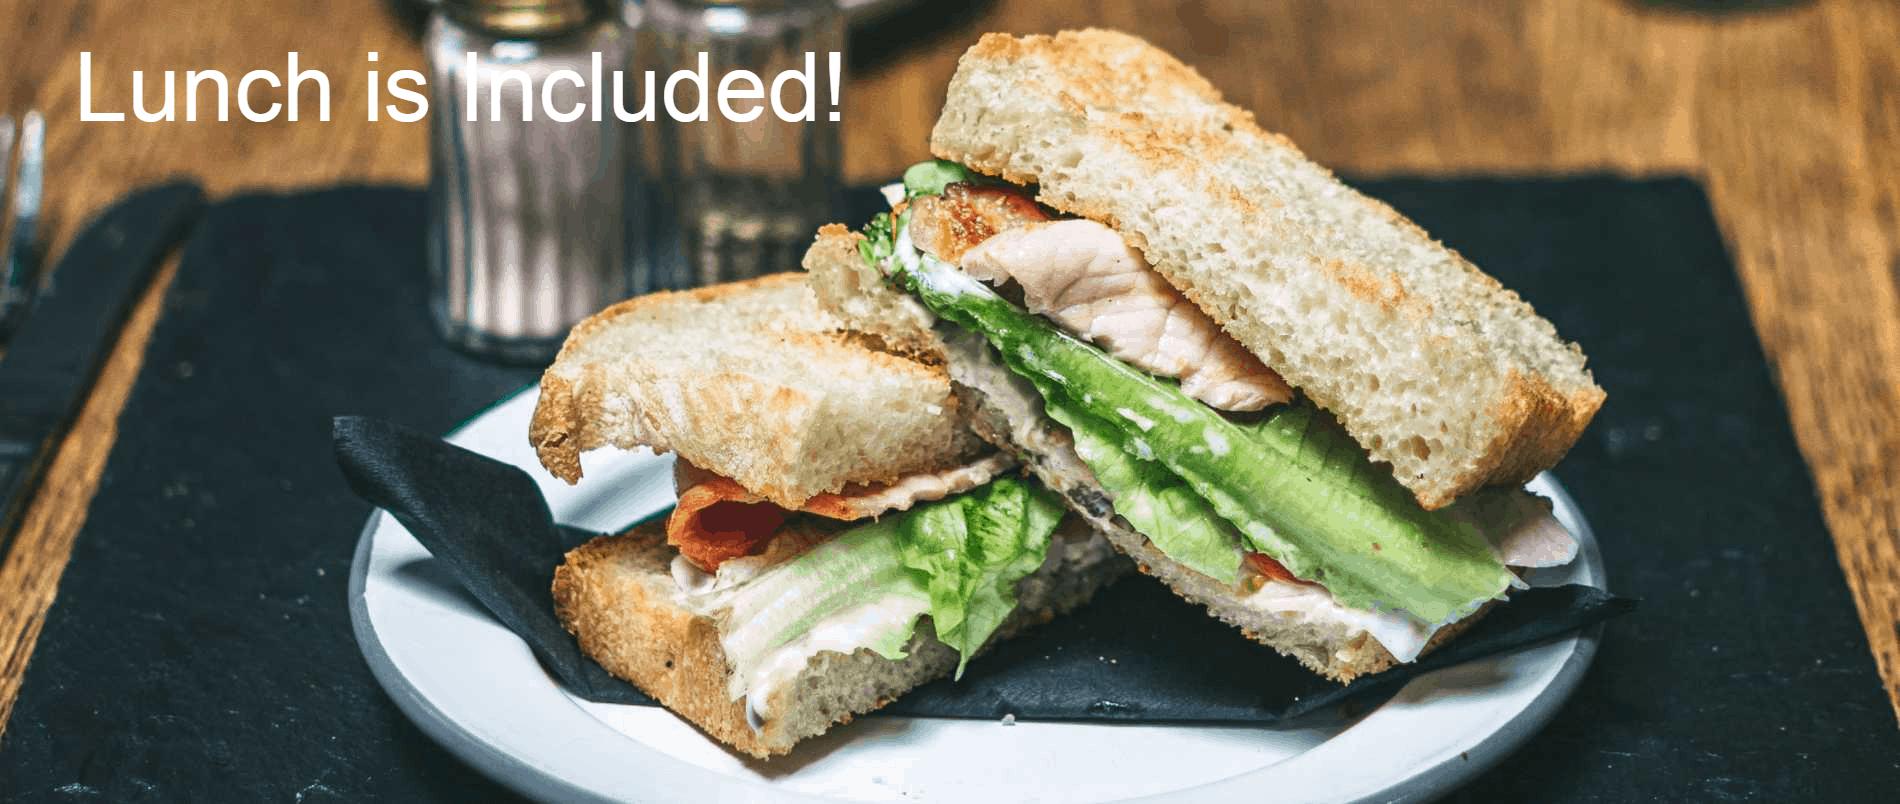 Sandwich 4 1900x800 Final